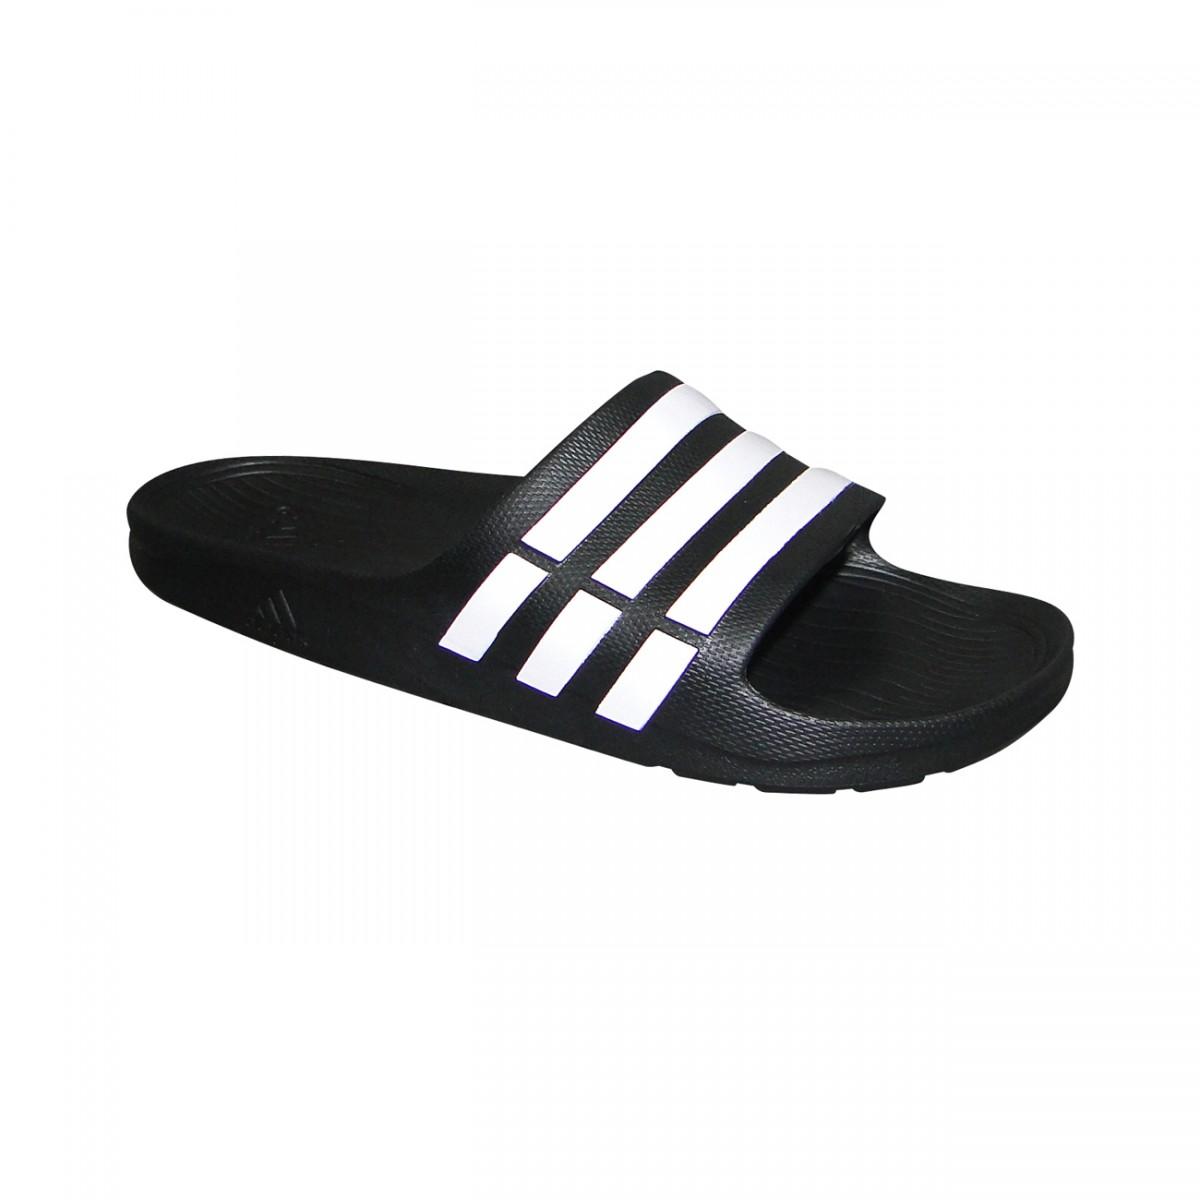 4b8e90720 Chinelo Adidas Duramo Slide Juvenil G06799 - Preto/Branco - Chuteira Nike,  Adidas. Sandalias Femininas. Sandy Calçados